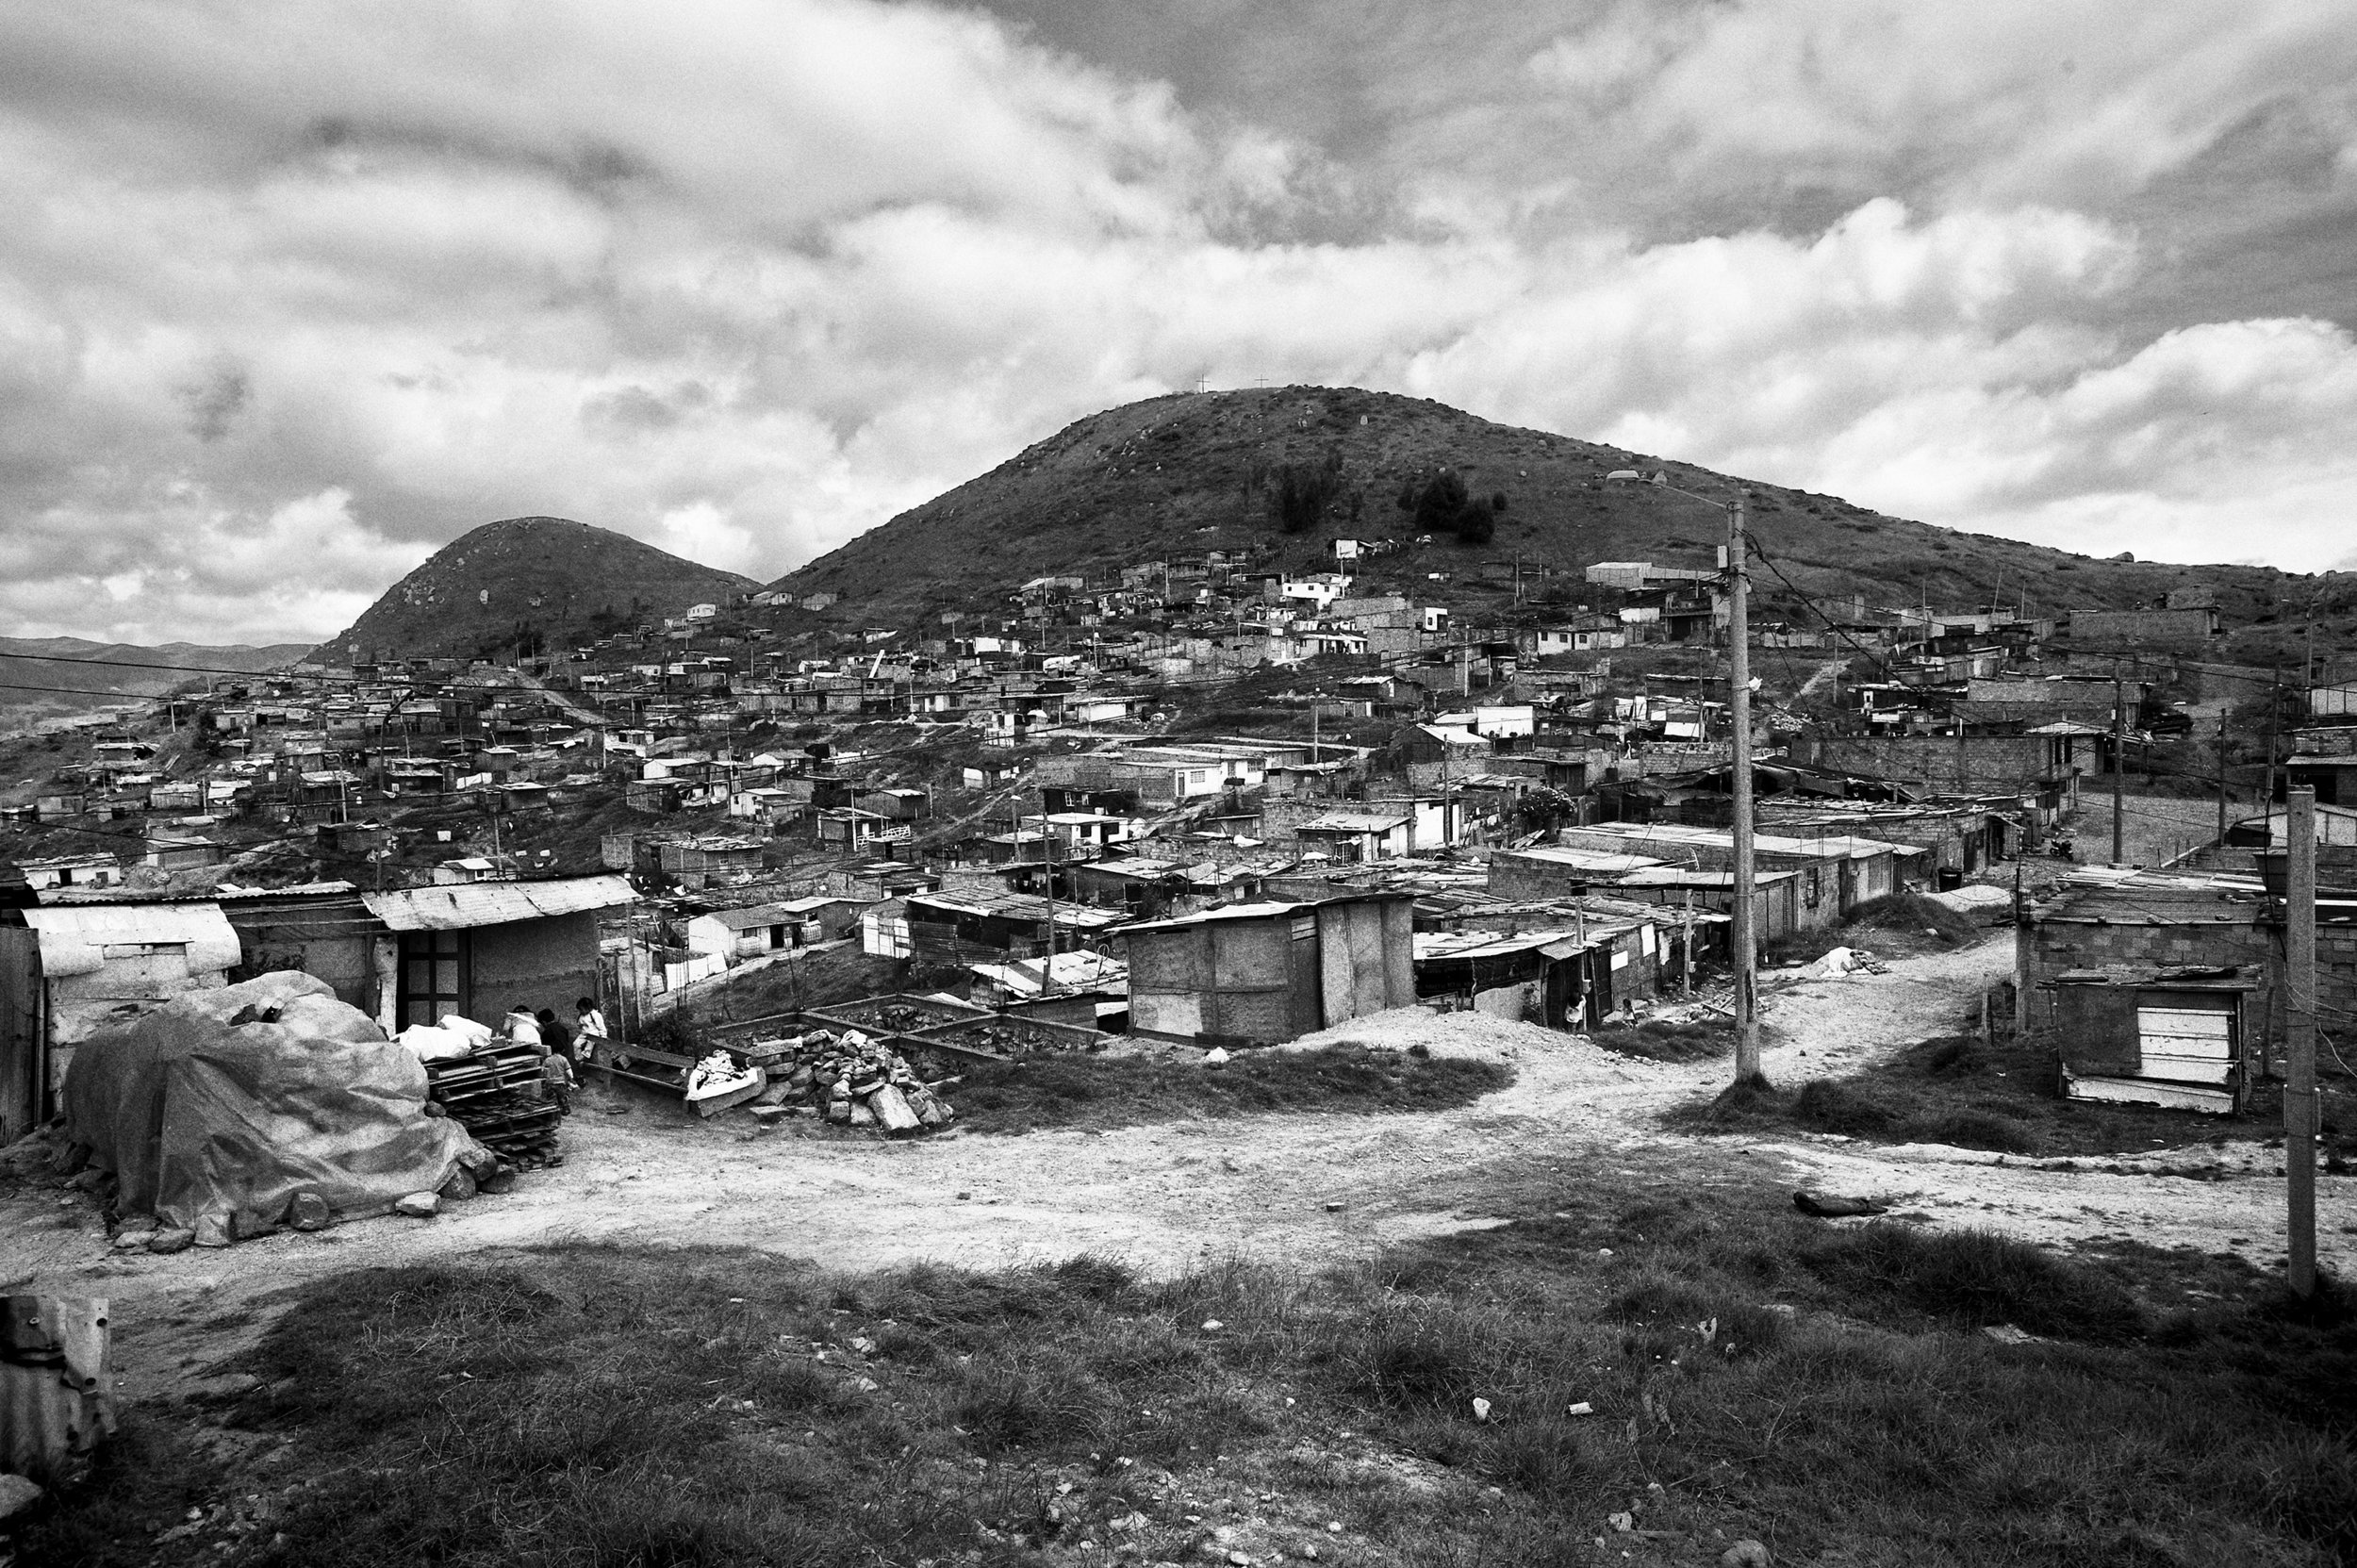 Via Panam, migration in the America's